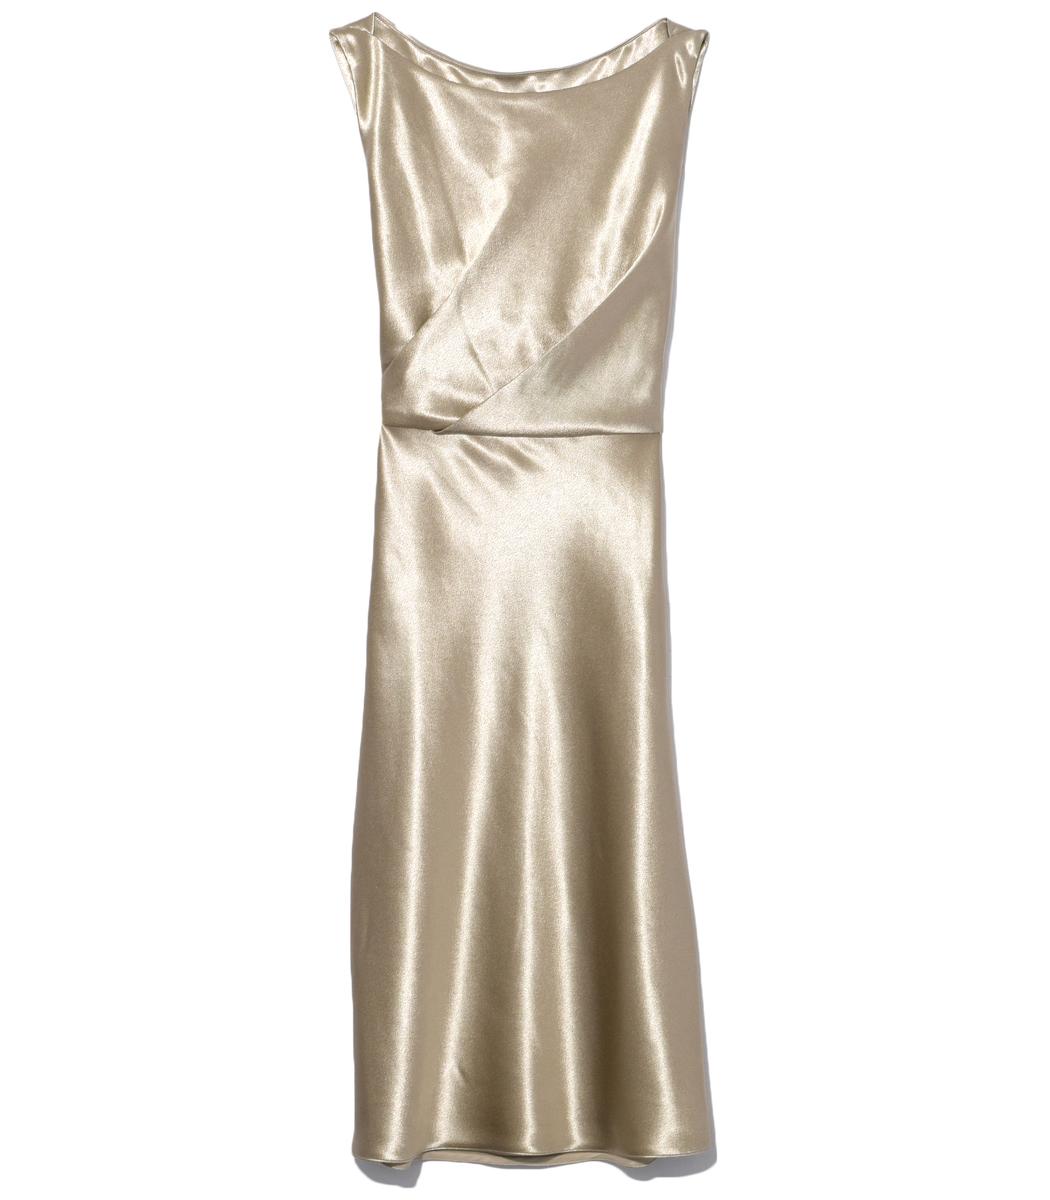 Gold Anne Wide Scoop Neck Dress